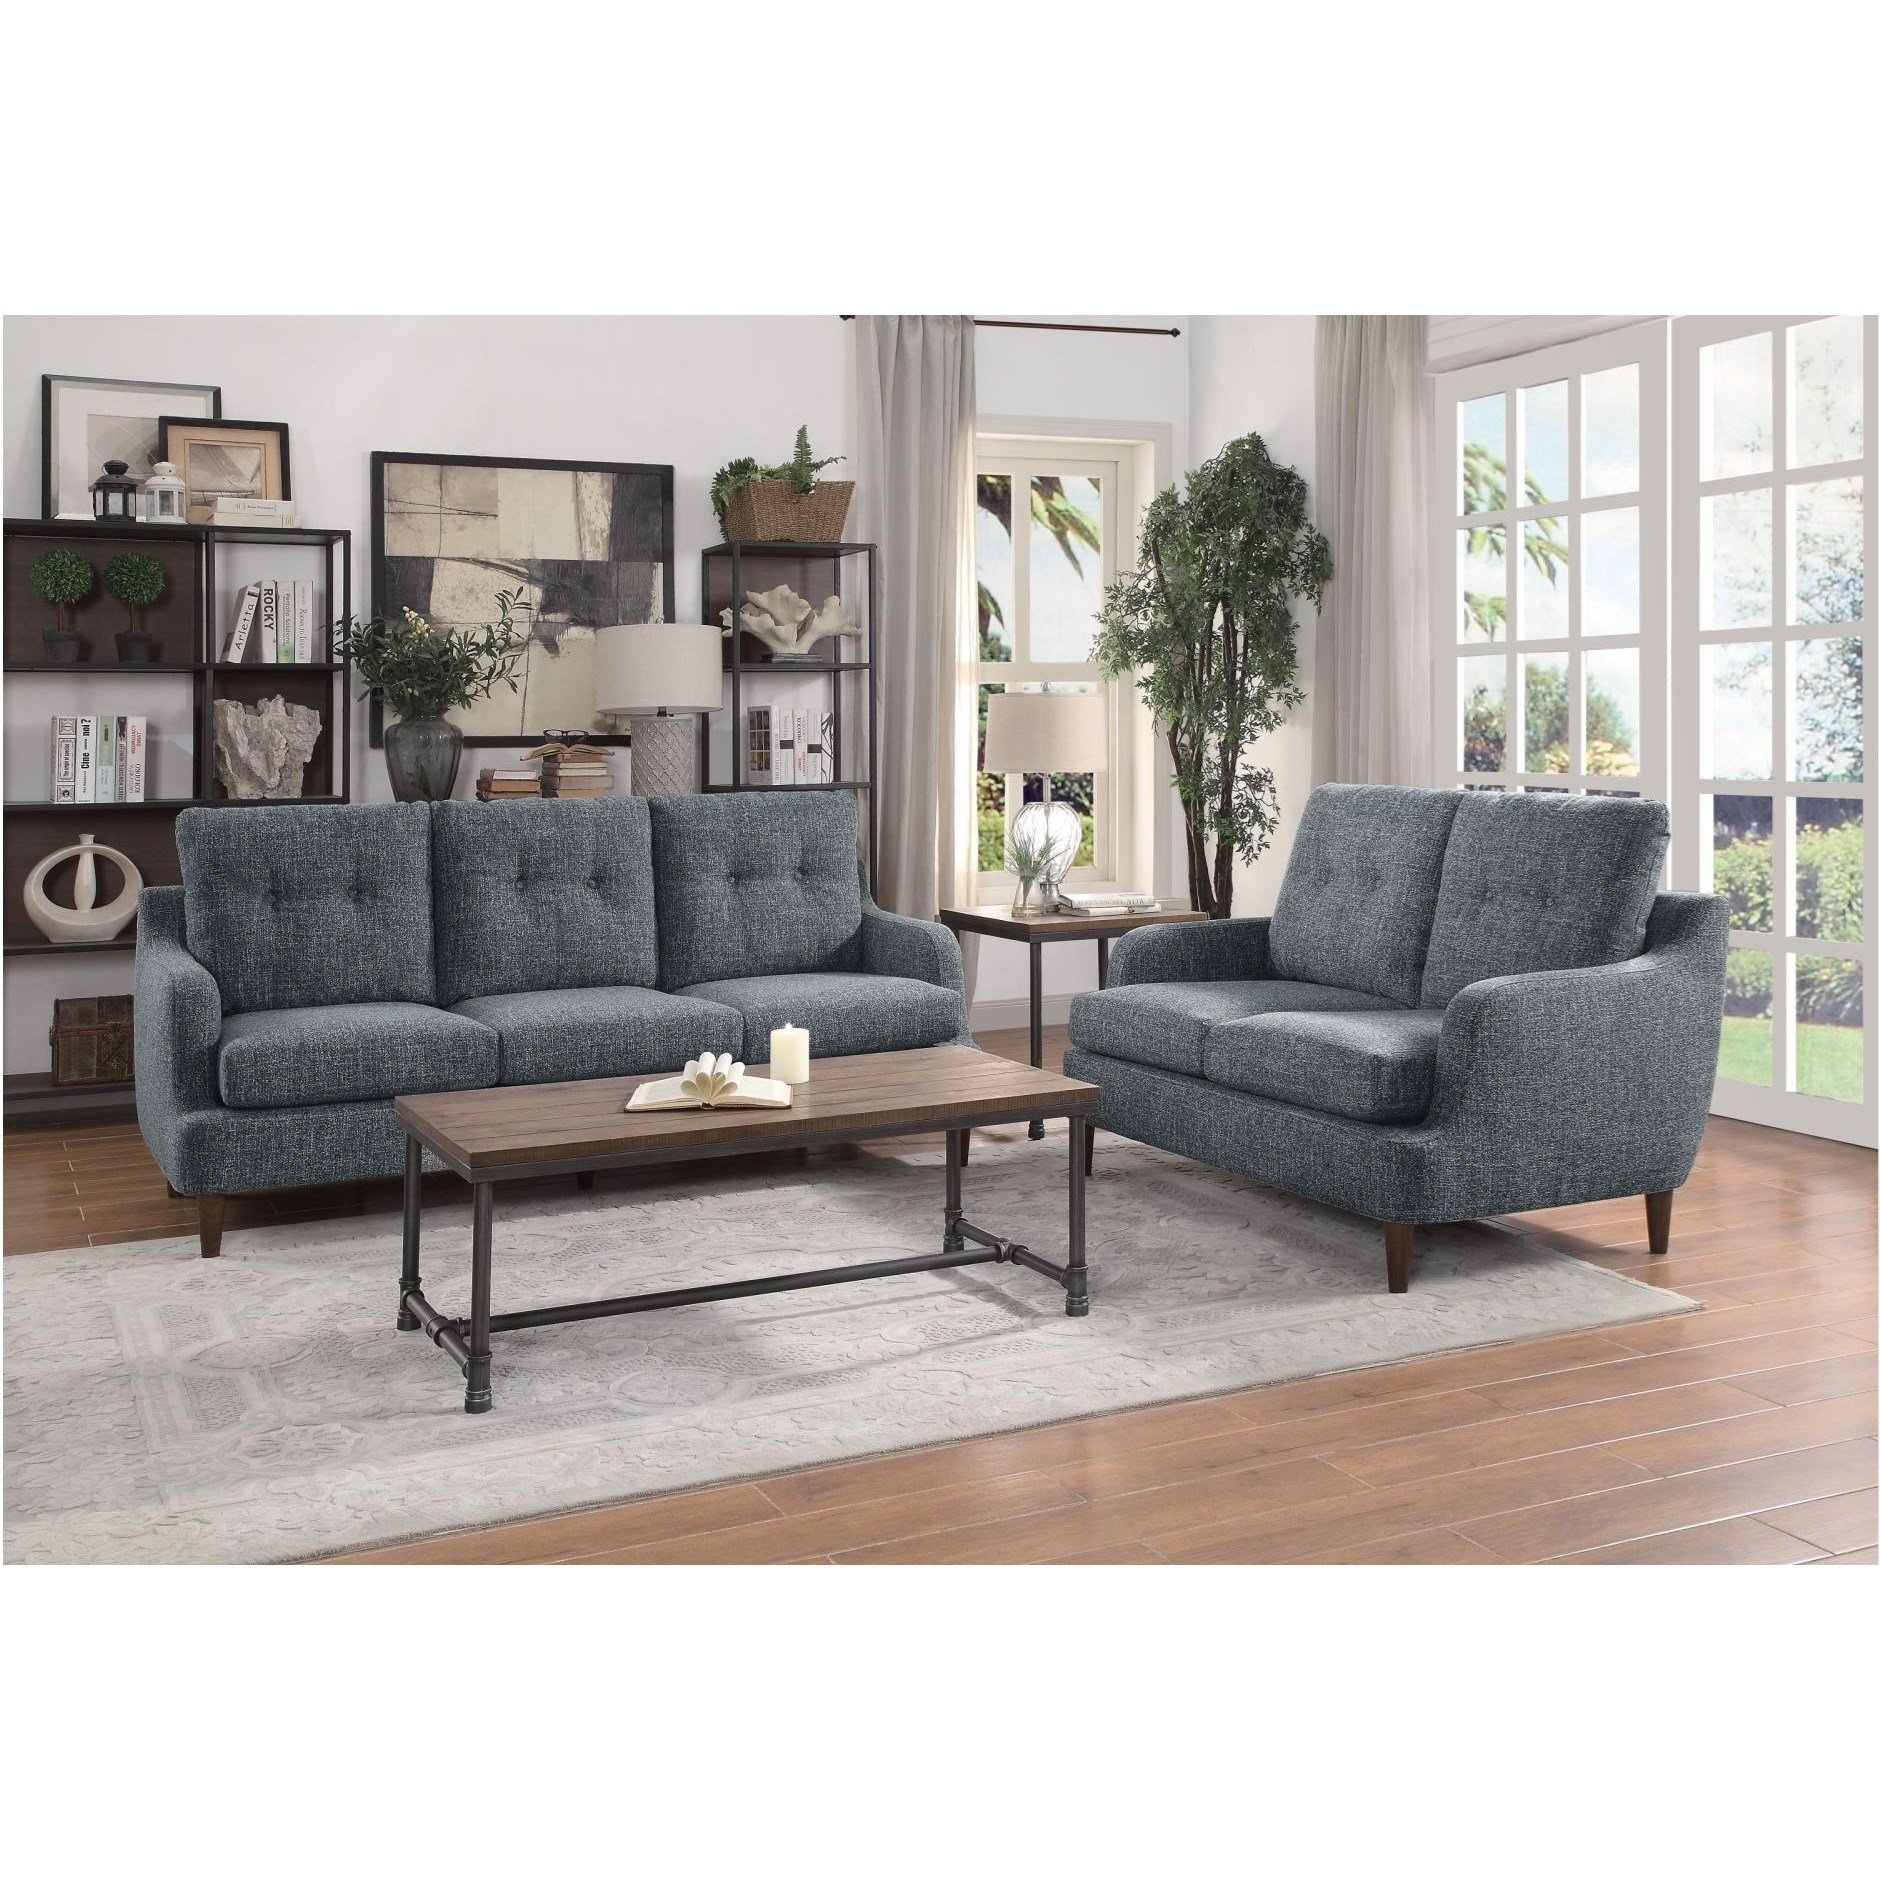 homelegance cagle transitional sofa value city furniture On cagle furniture